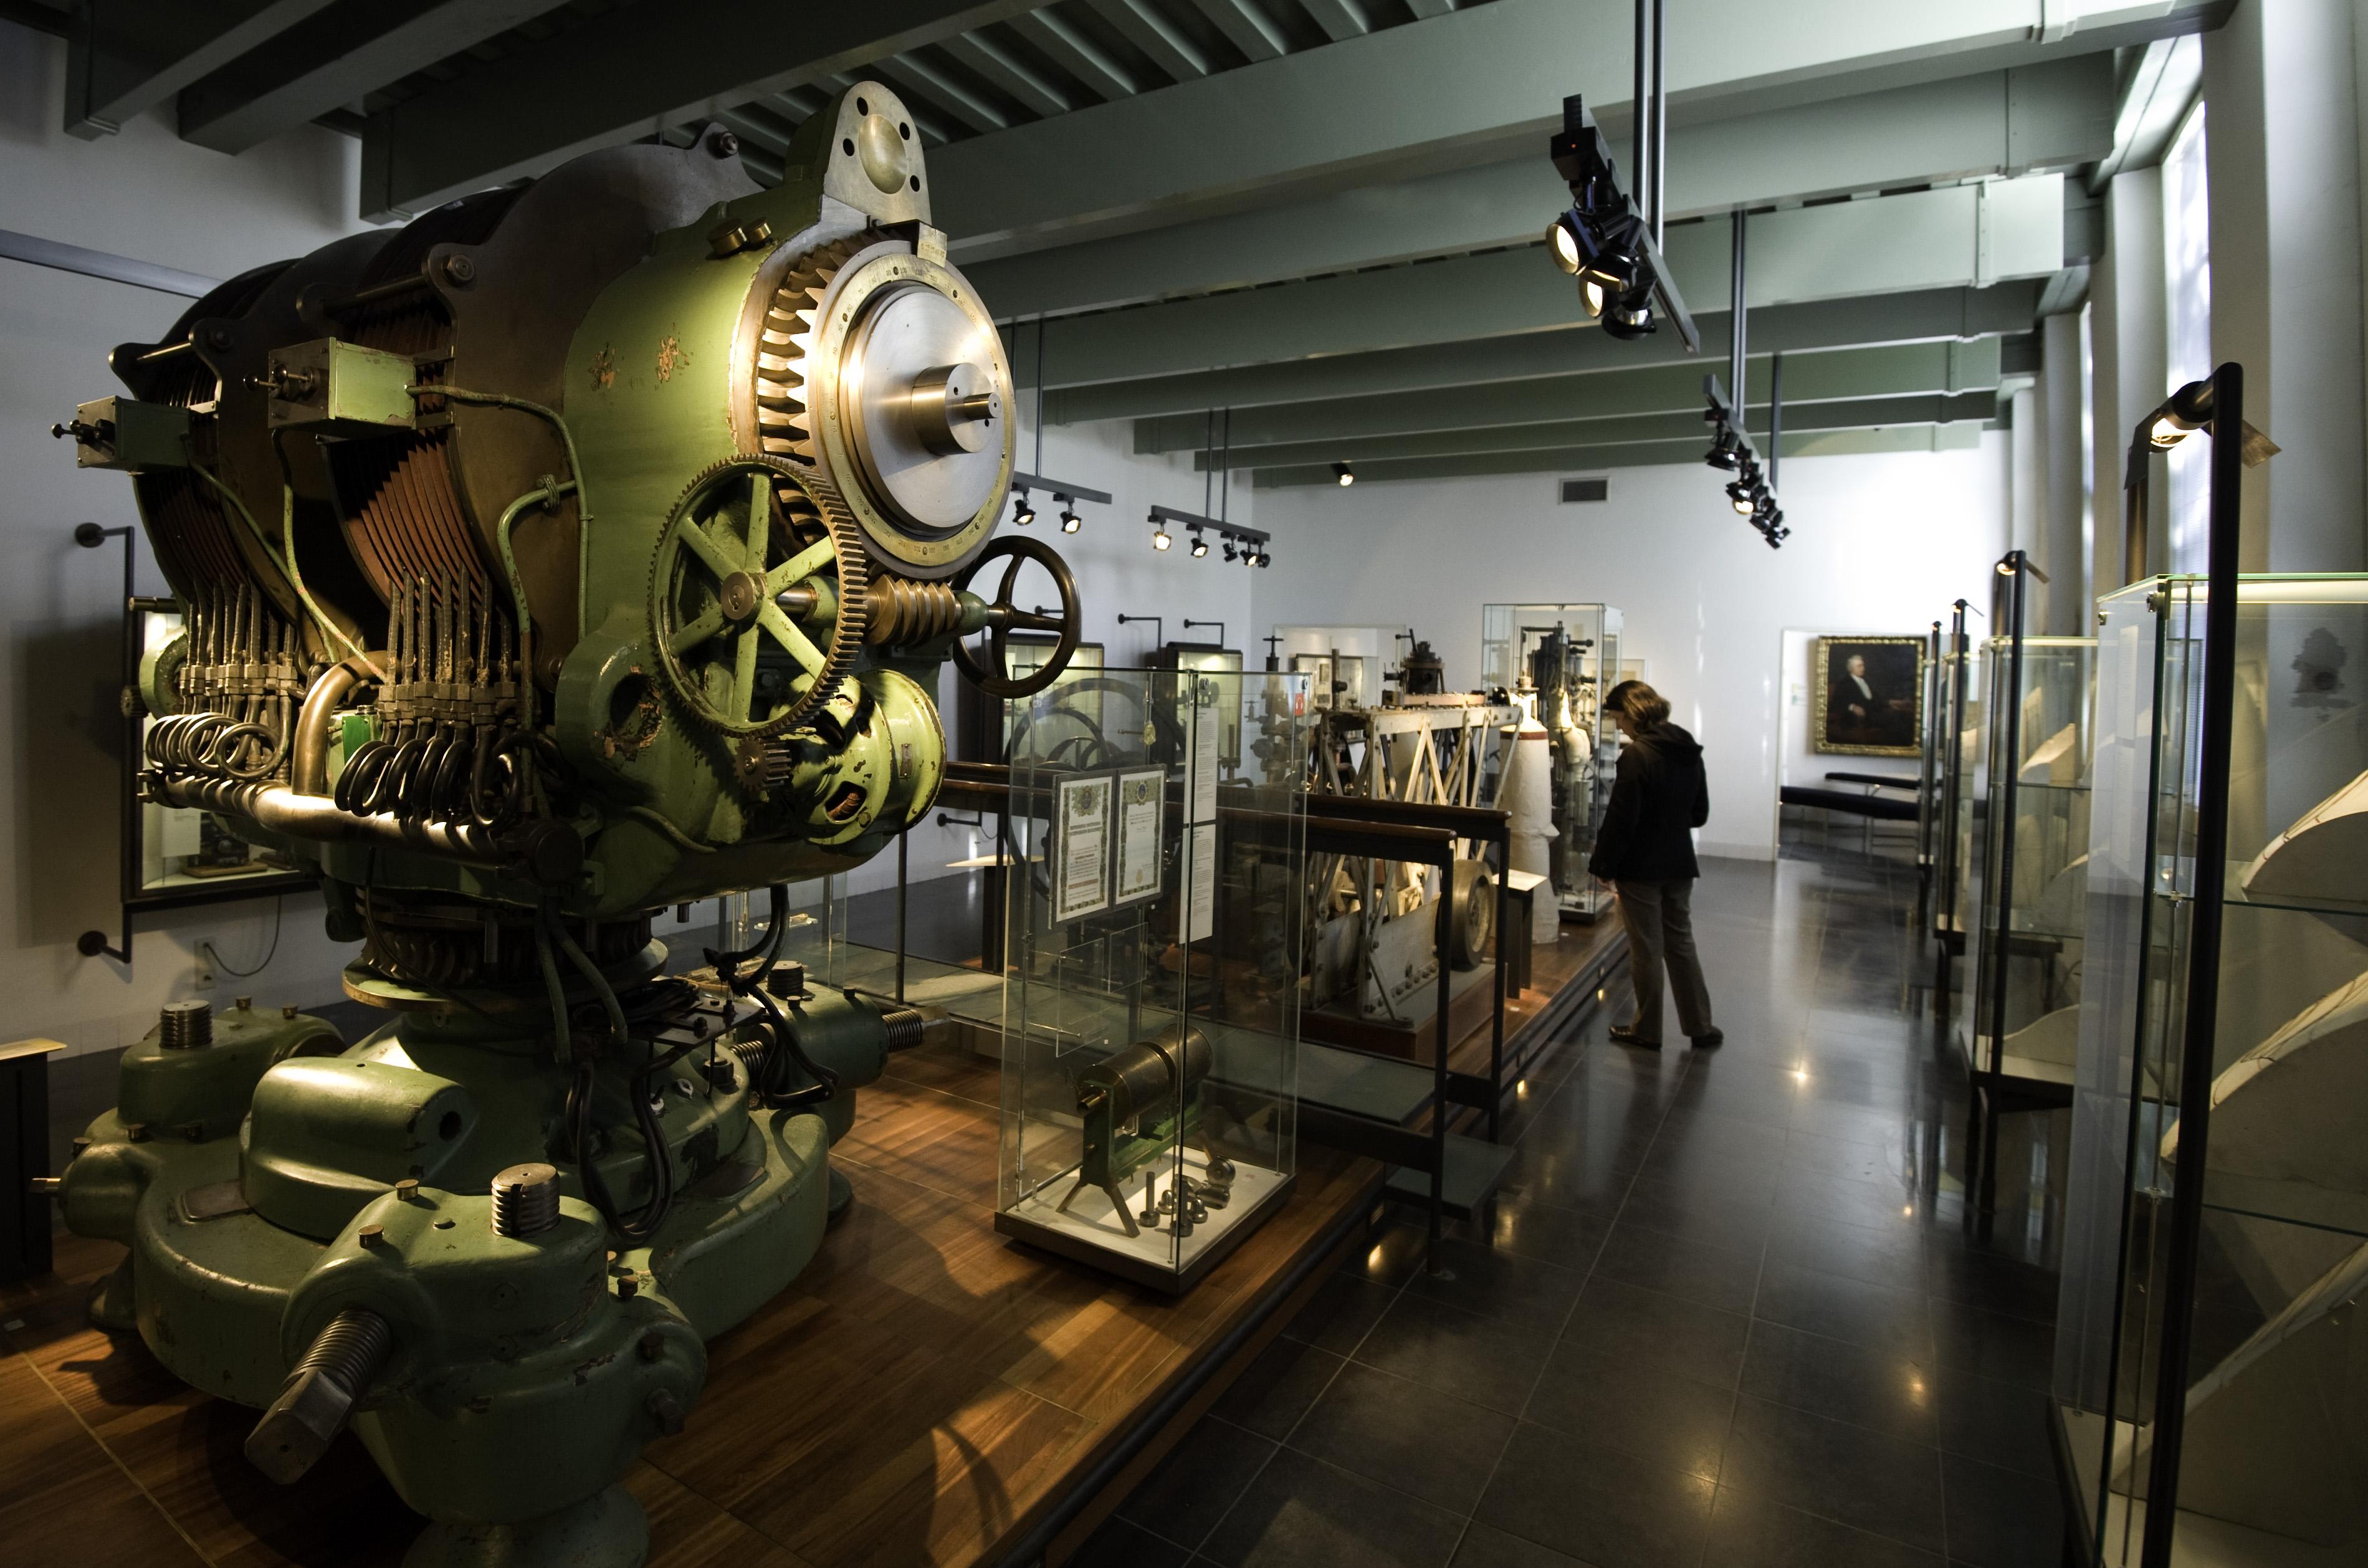 museum boerhaave room 21 physics.jpg